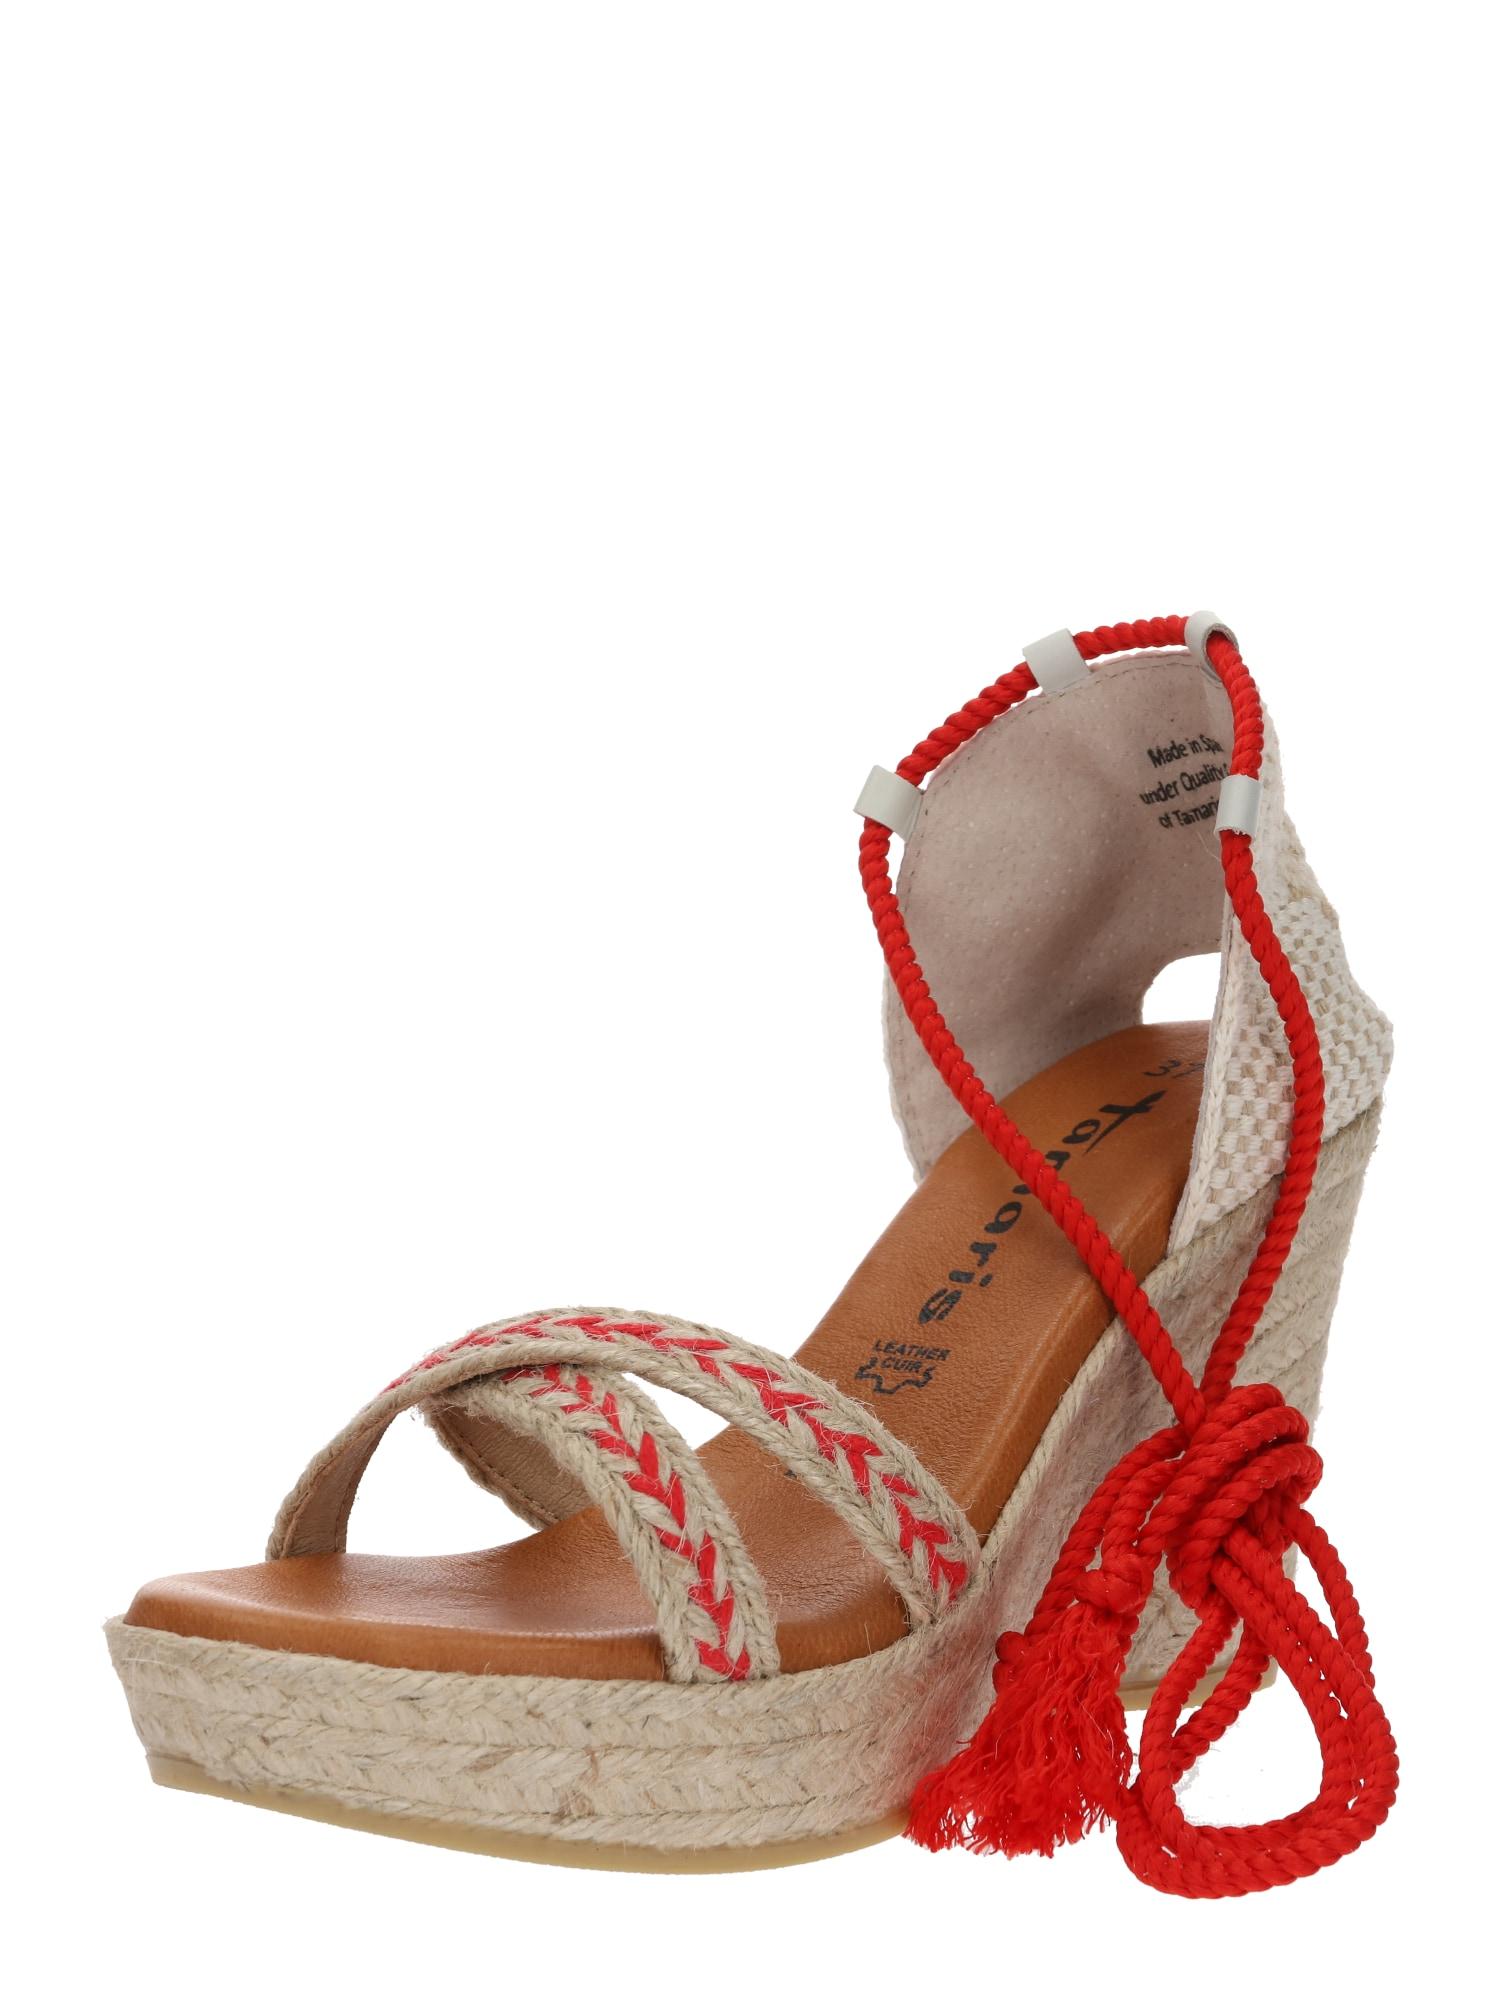 Páskové sandály Wedge Sandle béžová červená TAMARIS